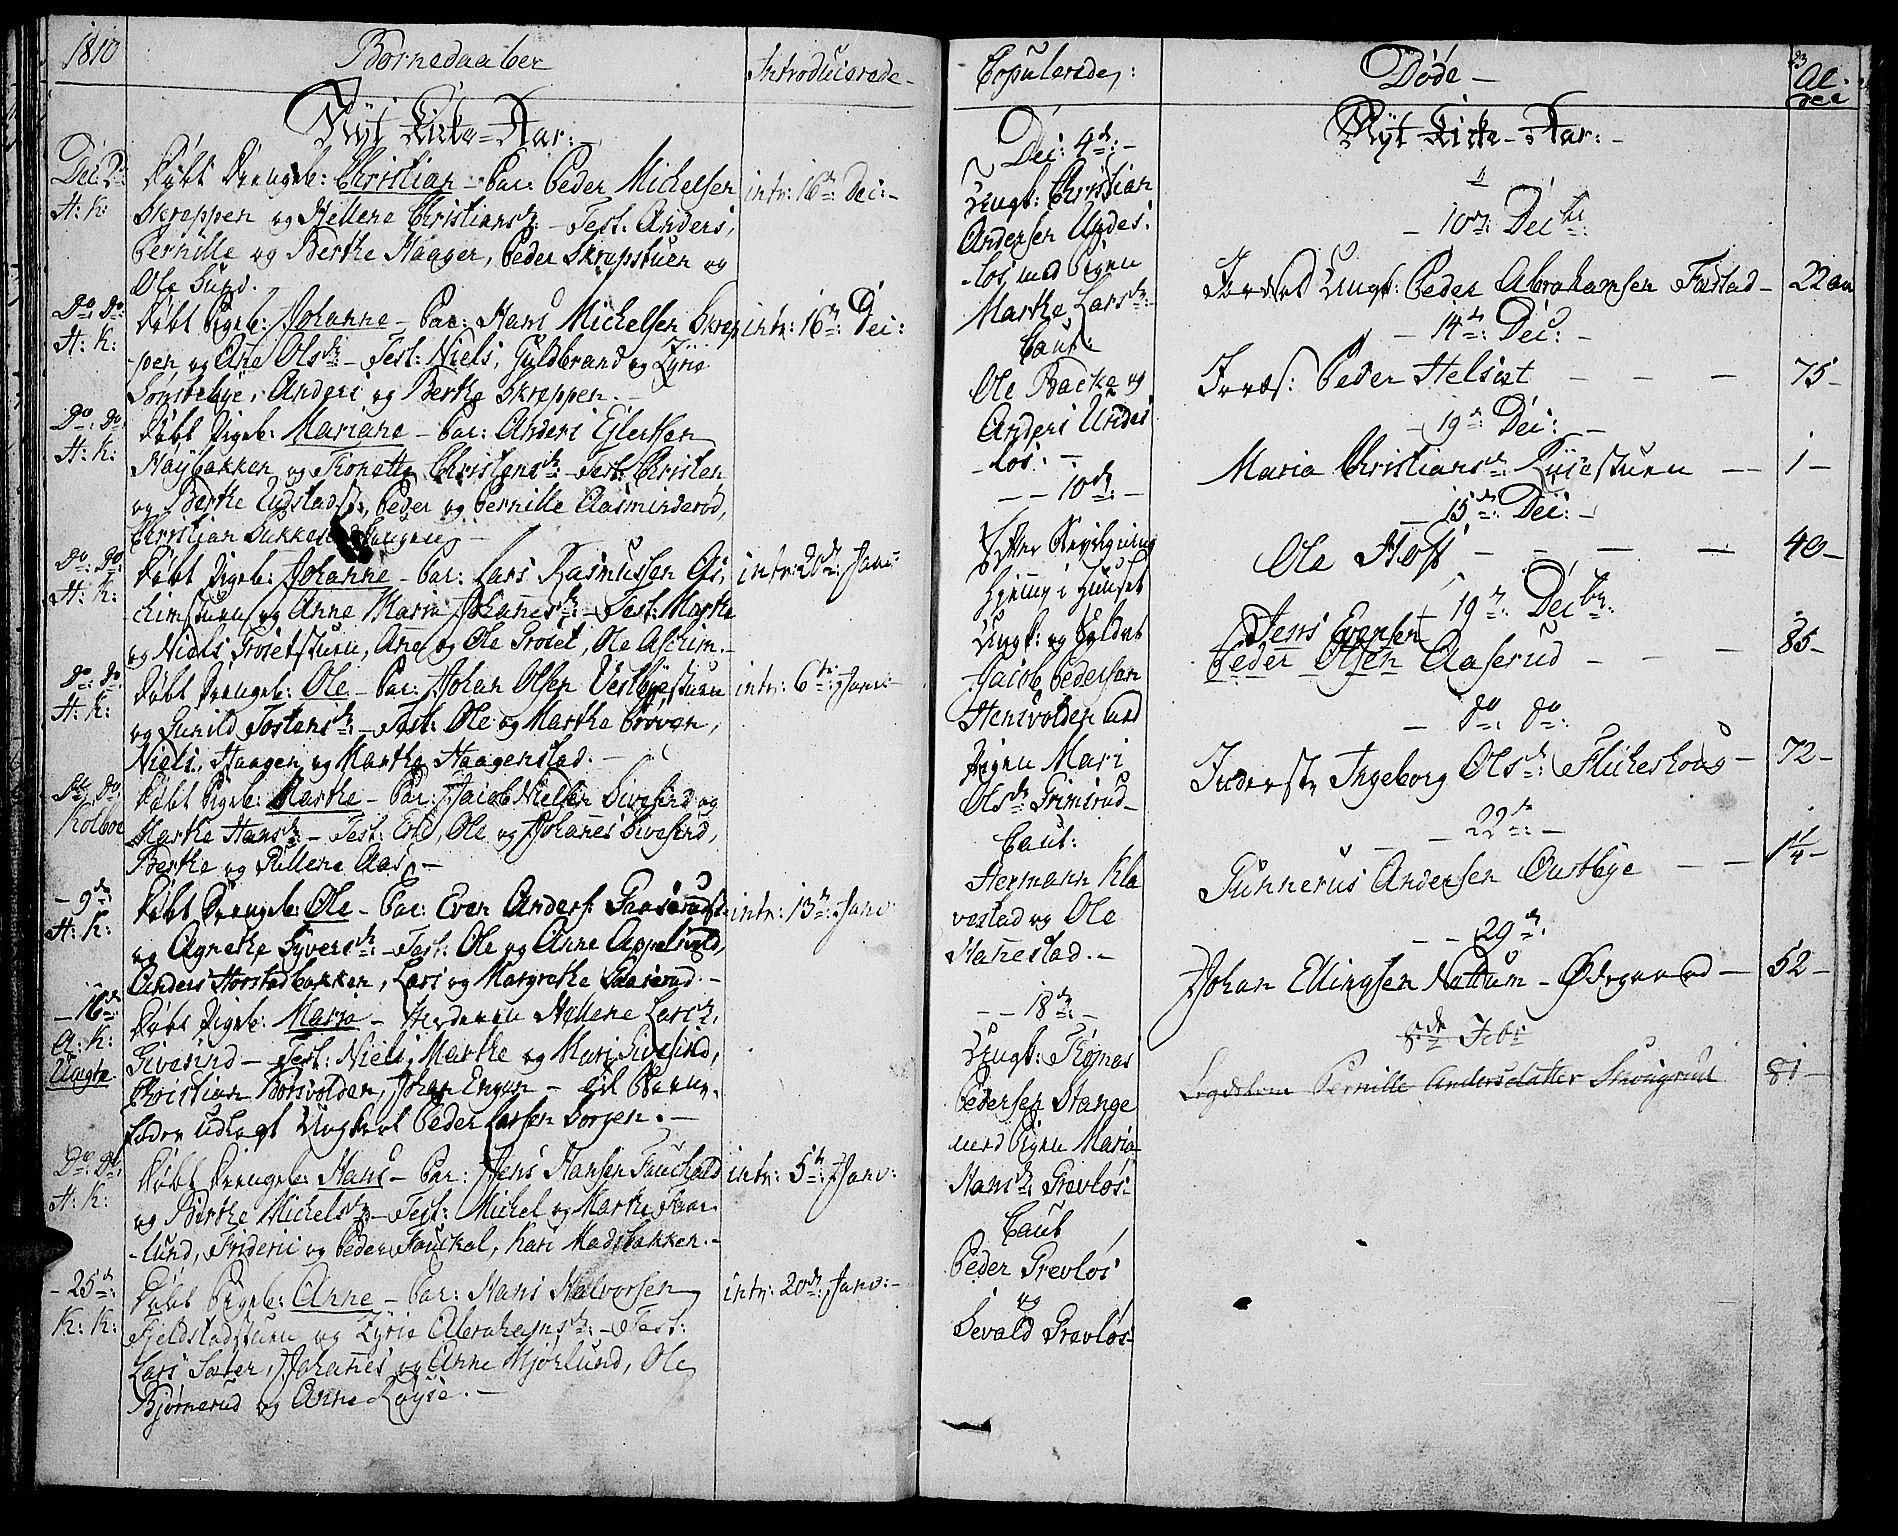 SAH, Toten prestekontor, Ministerialbok nr. 8, 1809-1814, s. 23